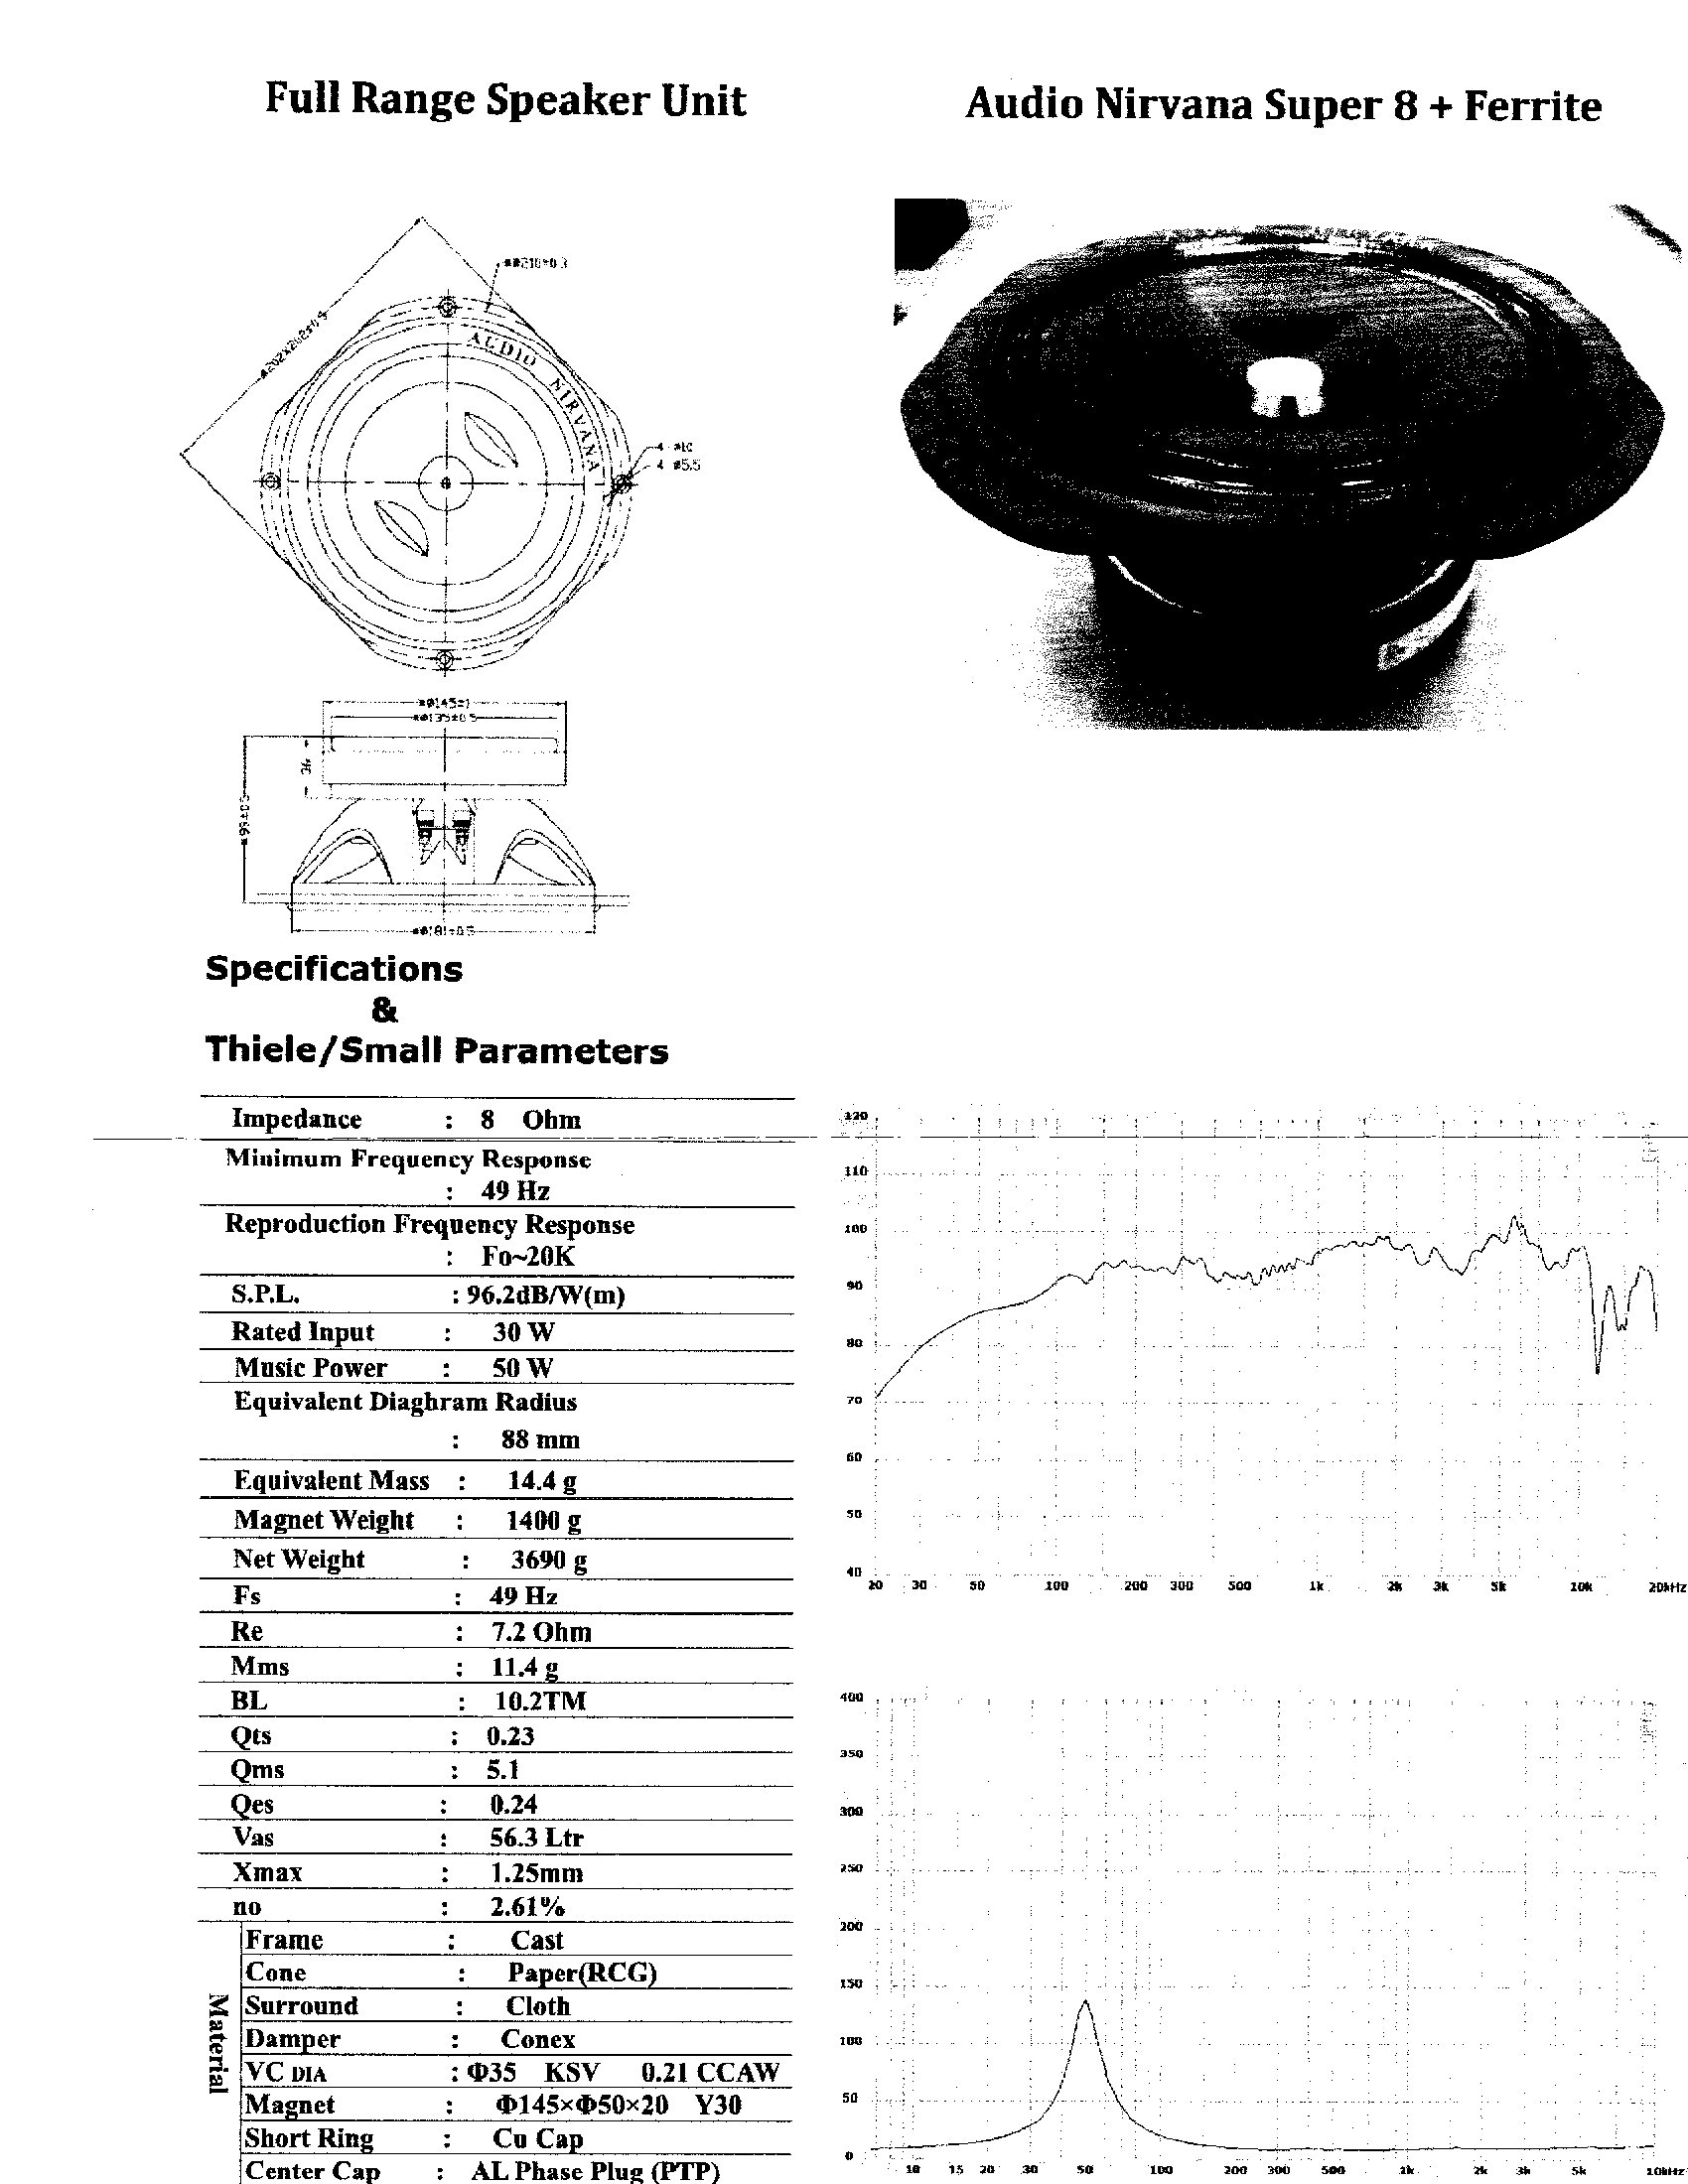 Audio Nirvana Full Range Speakers Diy Speaker Kits And